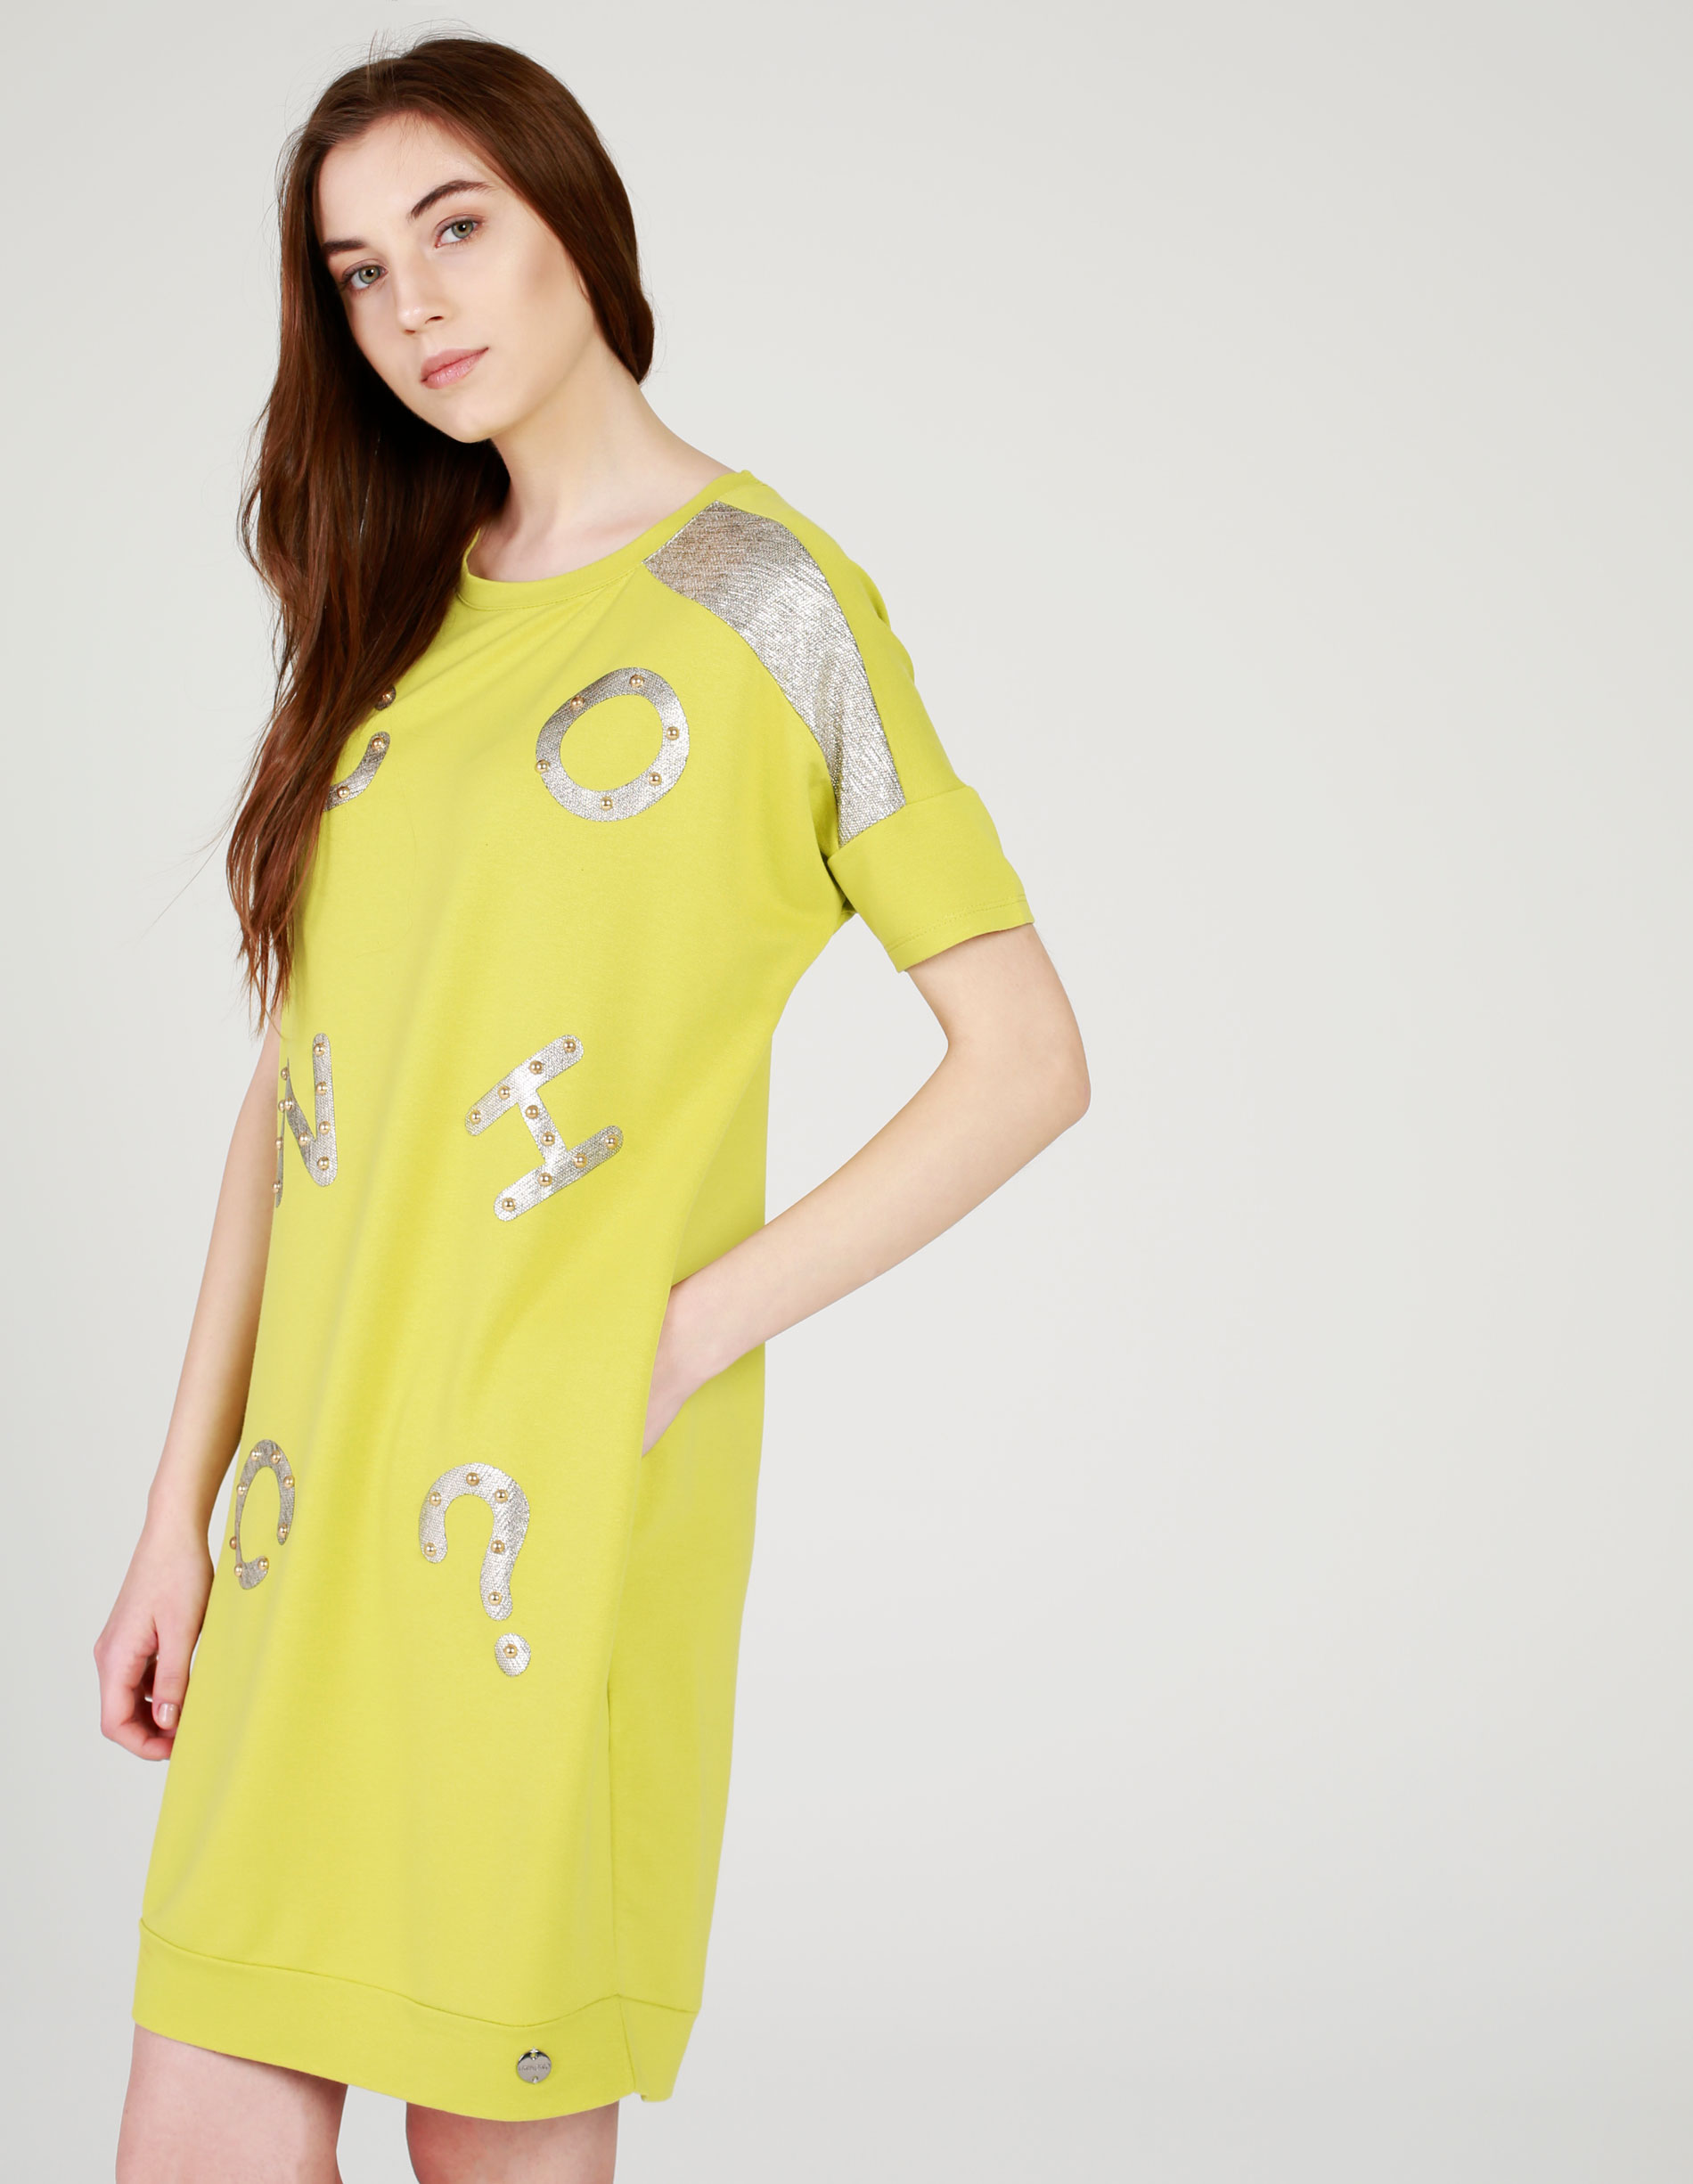 Sukienka - 4-9090 YELLOW - Unisono